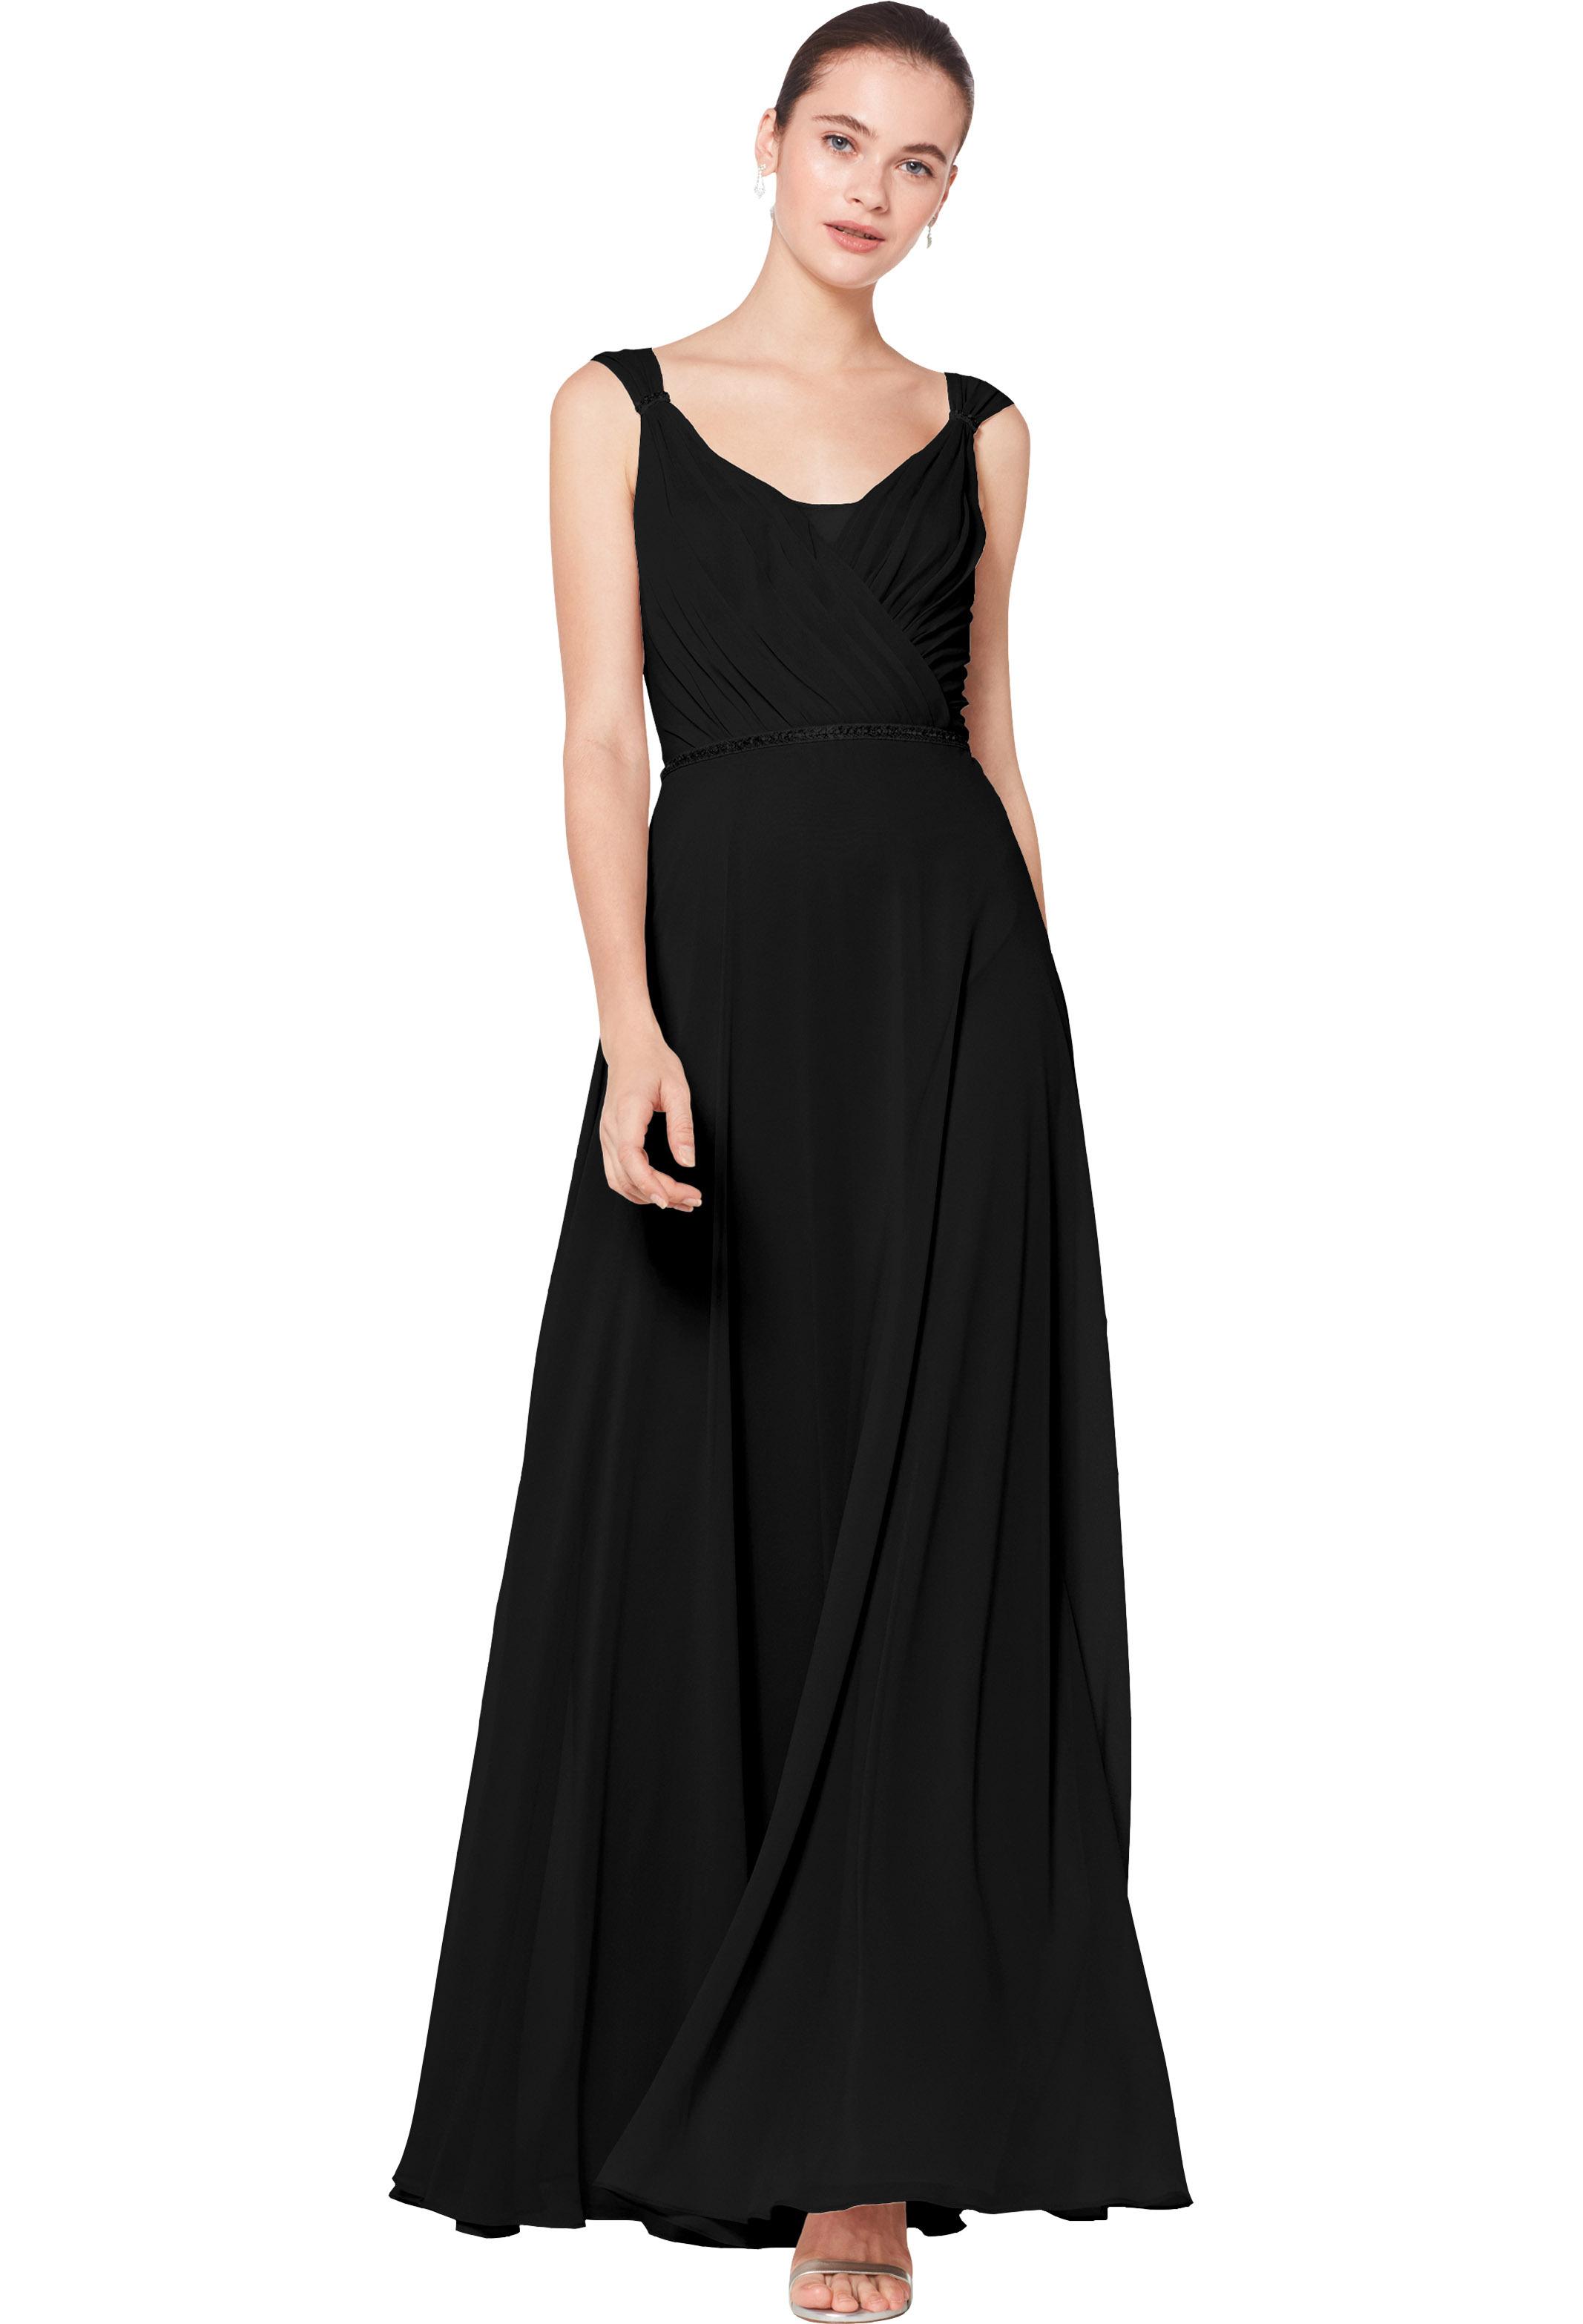 Bill Levkoff BLACK Chiffon Sleeveless A-line gown, $230.00 Front